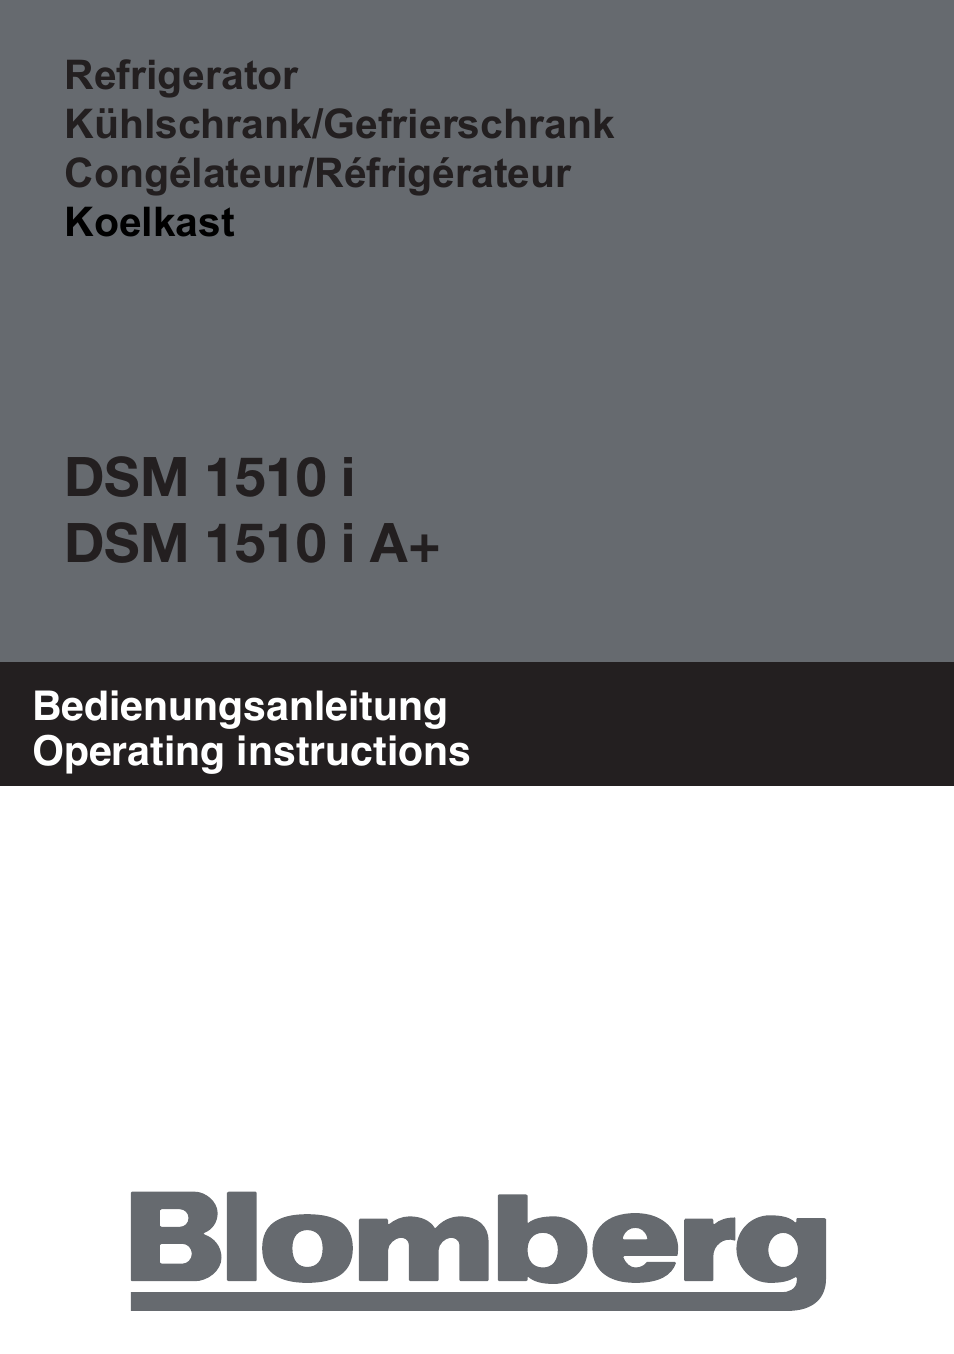 Blomberg DSM 1510 i User Manual | 135 pages | Also for: DSM 1510 i A+